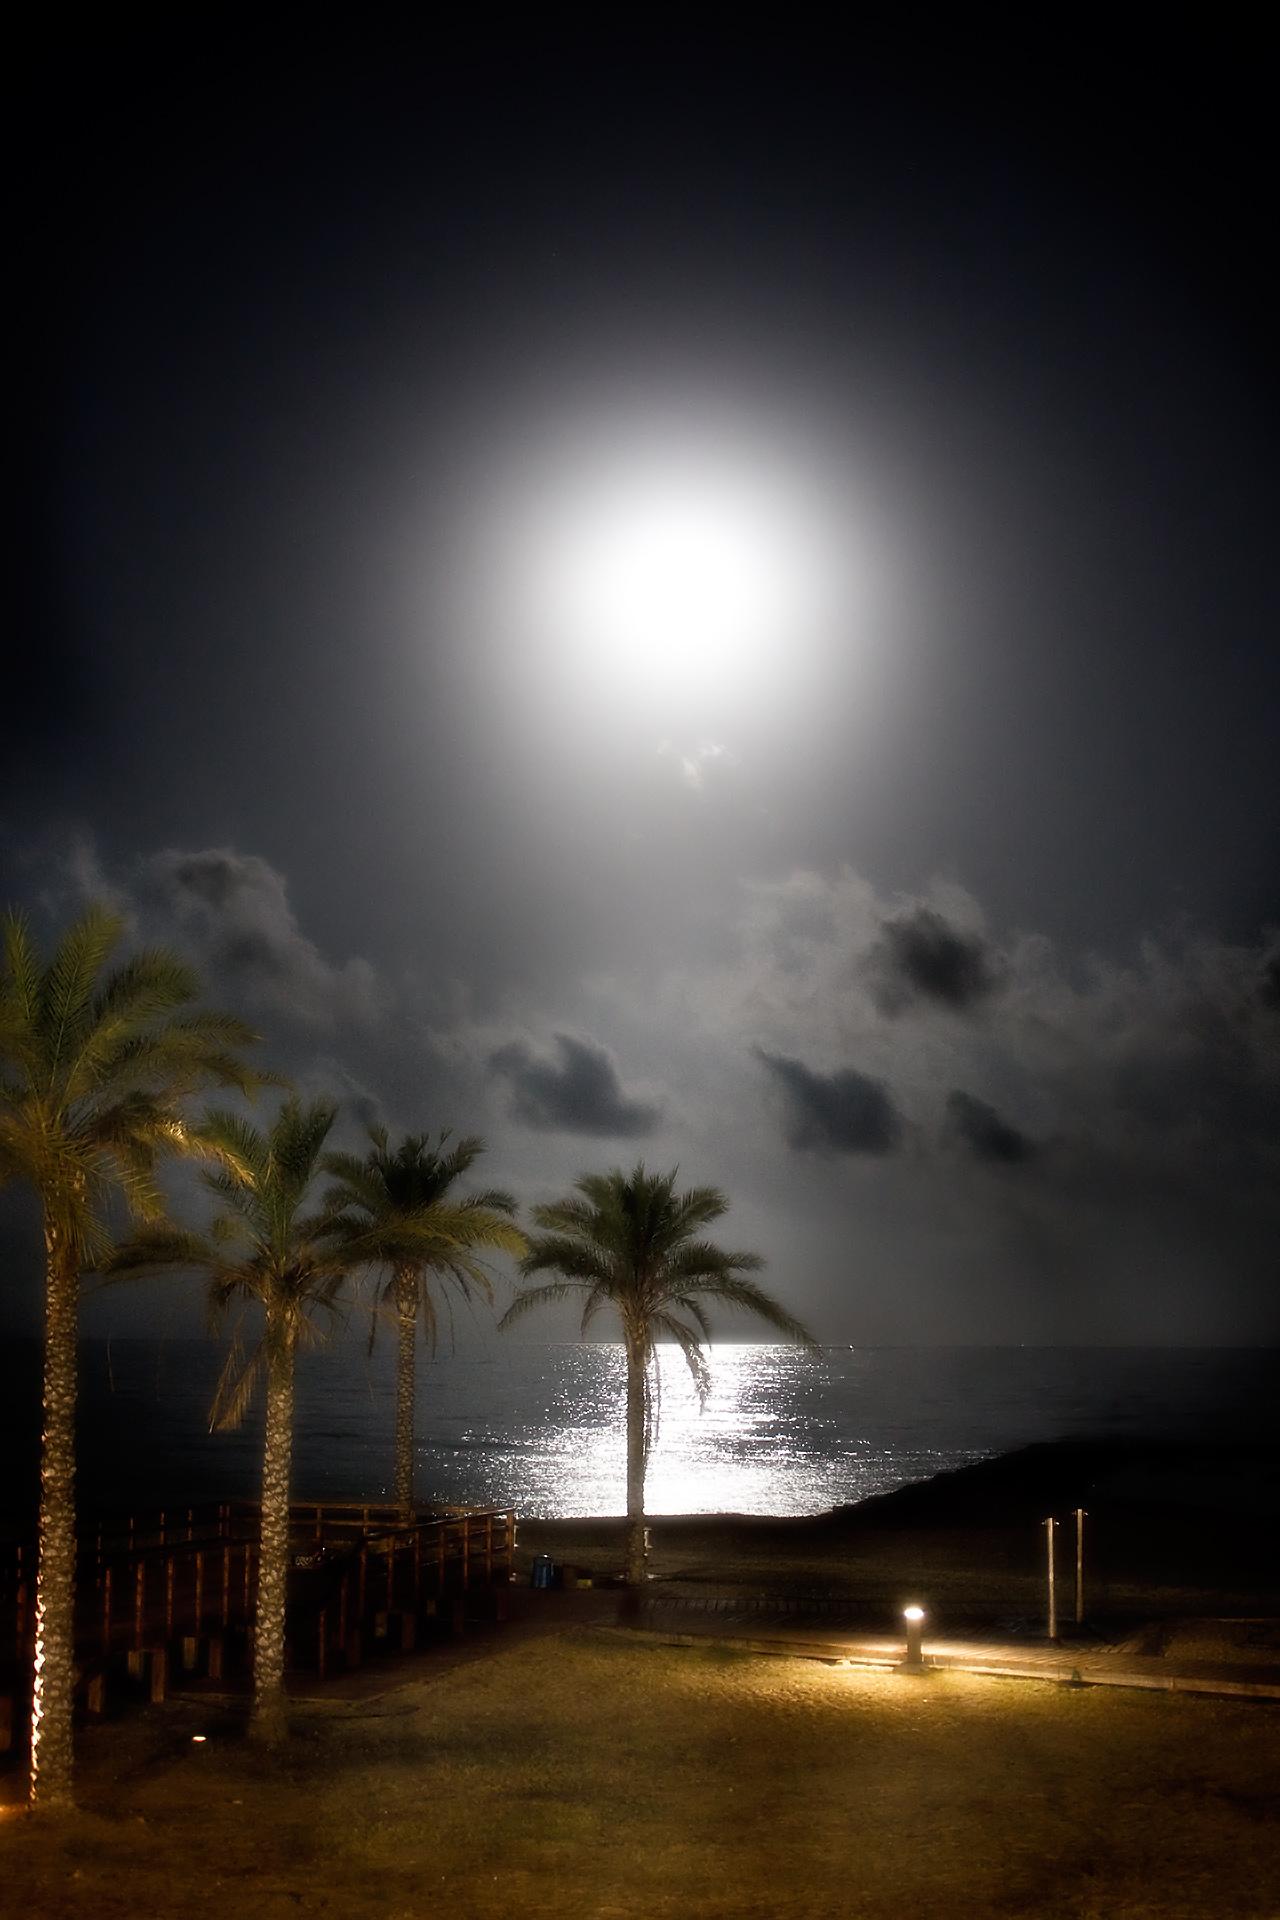 Playa L'Almadrava / Almadraba